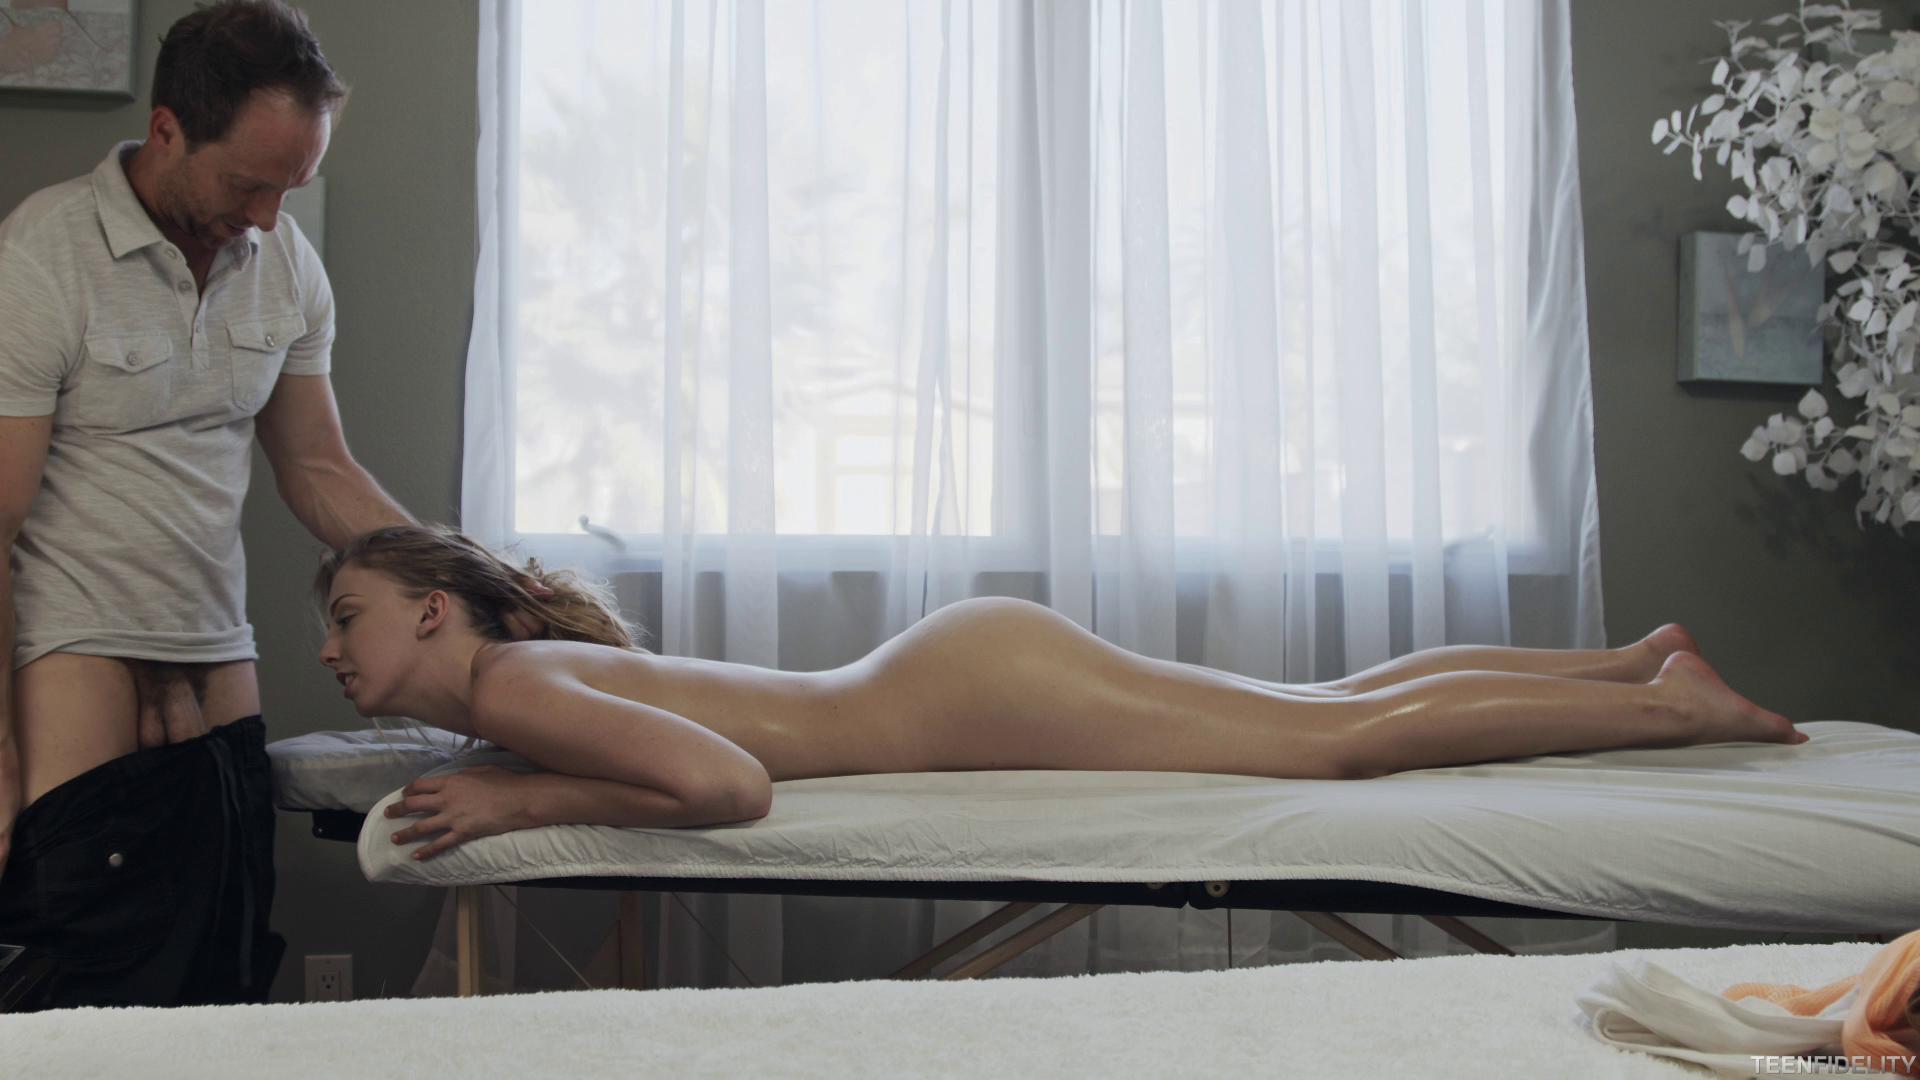 TeenFidelity – Chloe Scott Massage Me Hard Episode 272